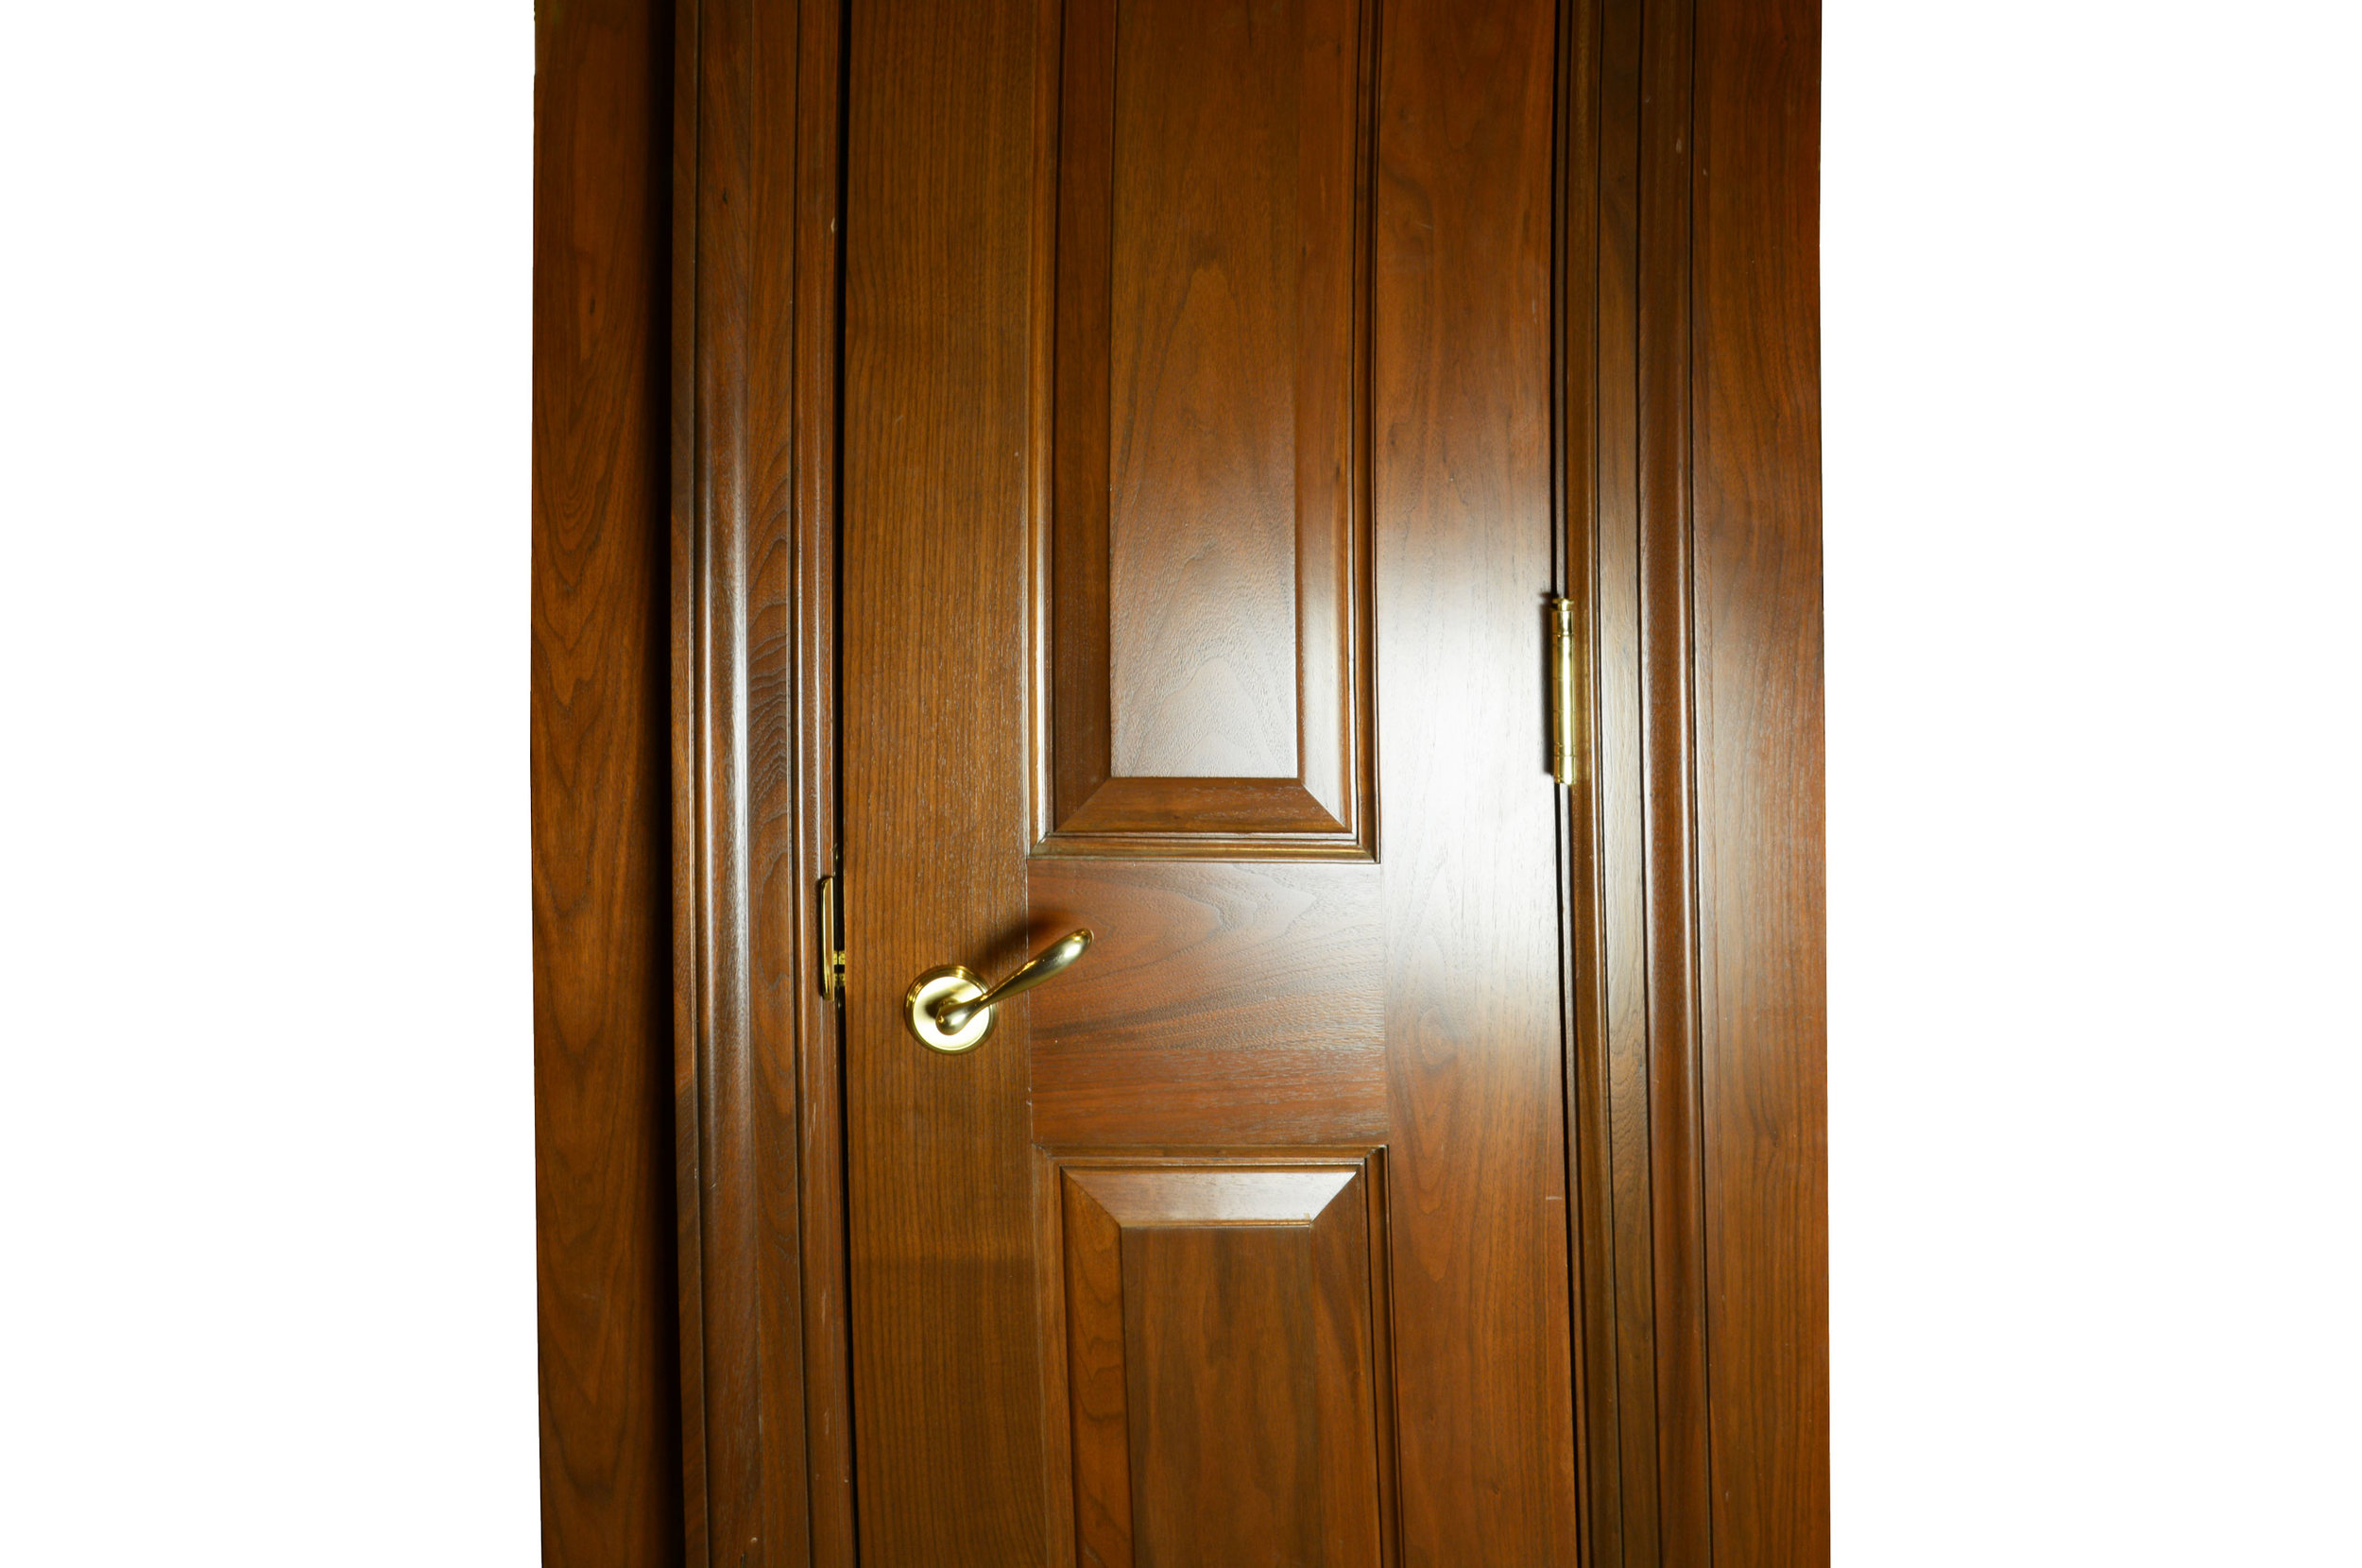 42263-walnut-closet-door-DETAIL.jpg